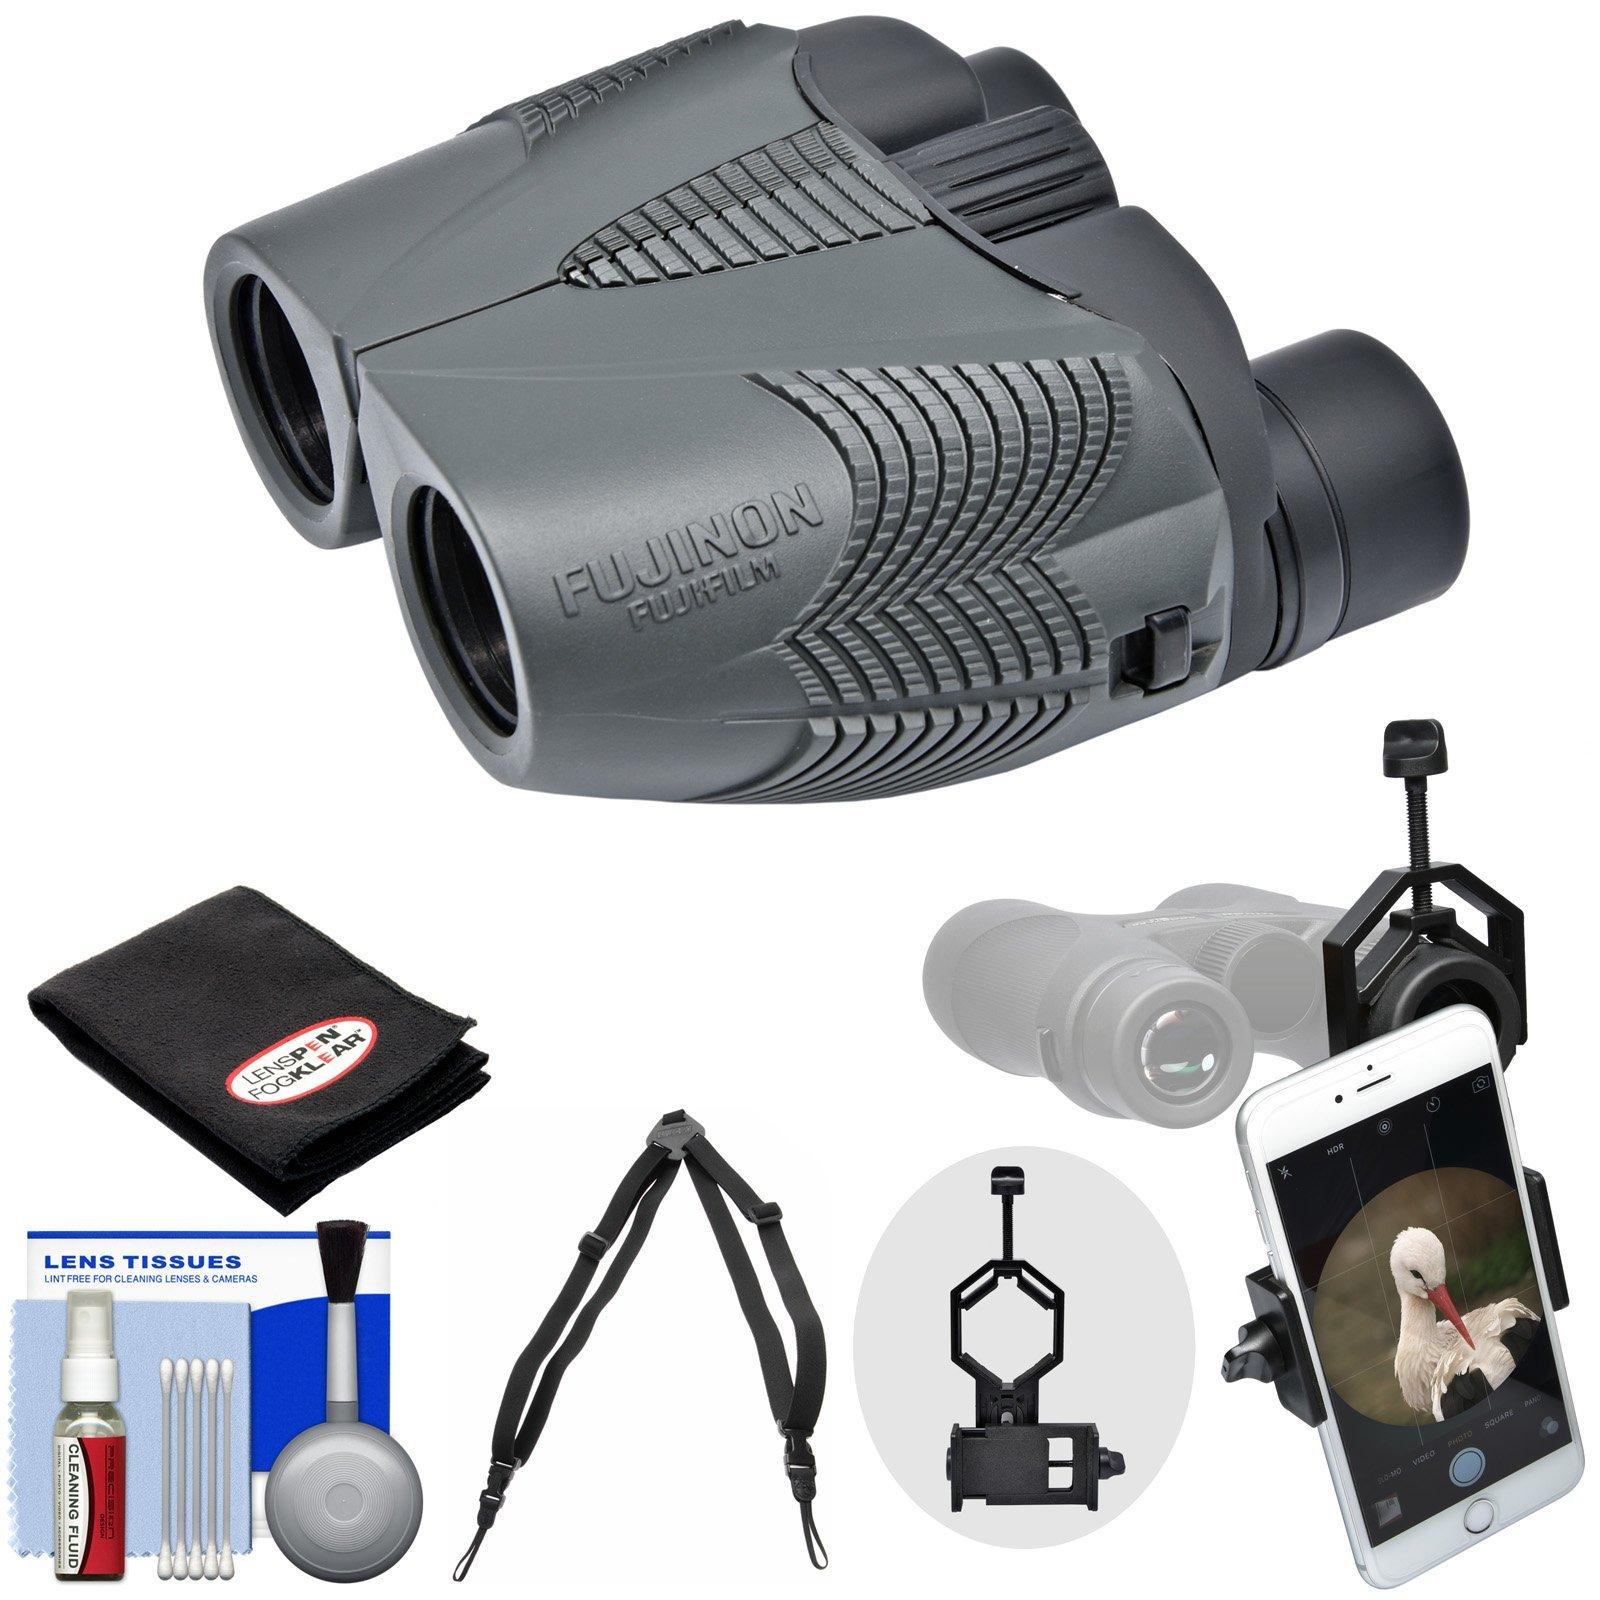 Fujifilm Fujinon KF M 8x25 Binoculars with Case with Smartphone Adapter + Harness + Cleaning Kit